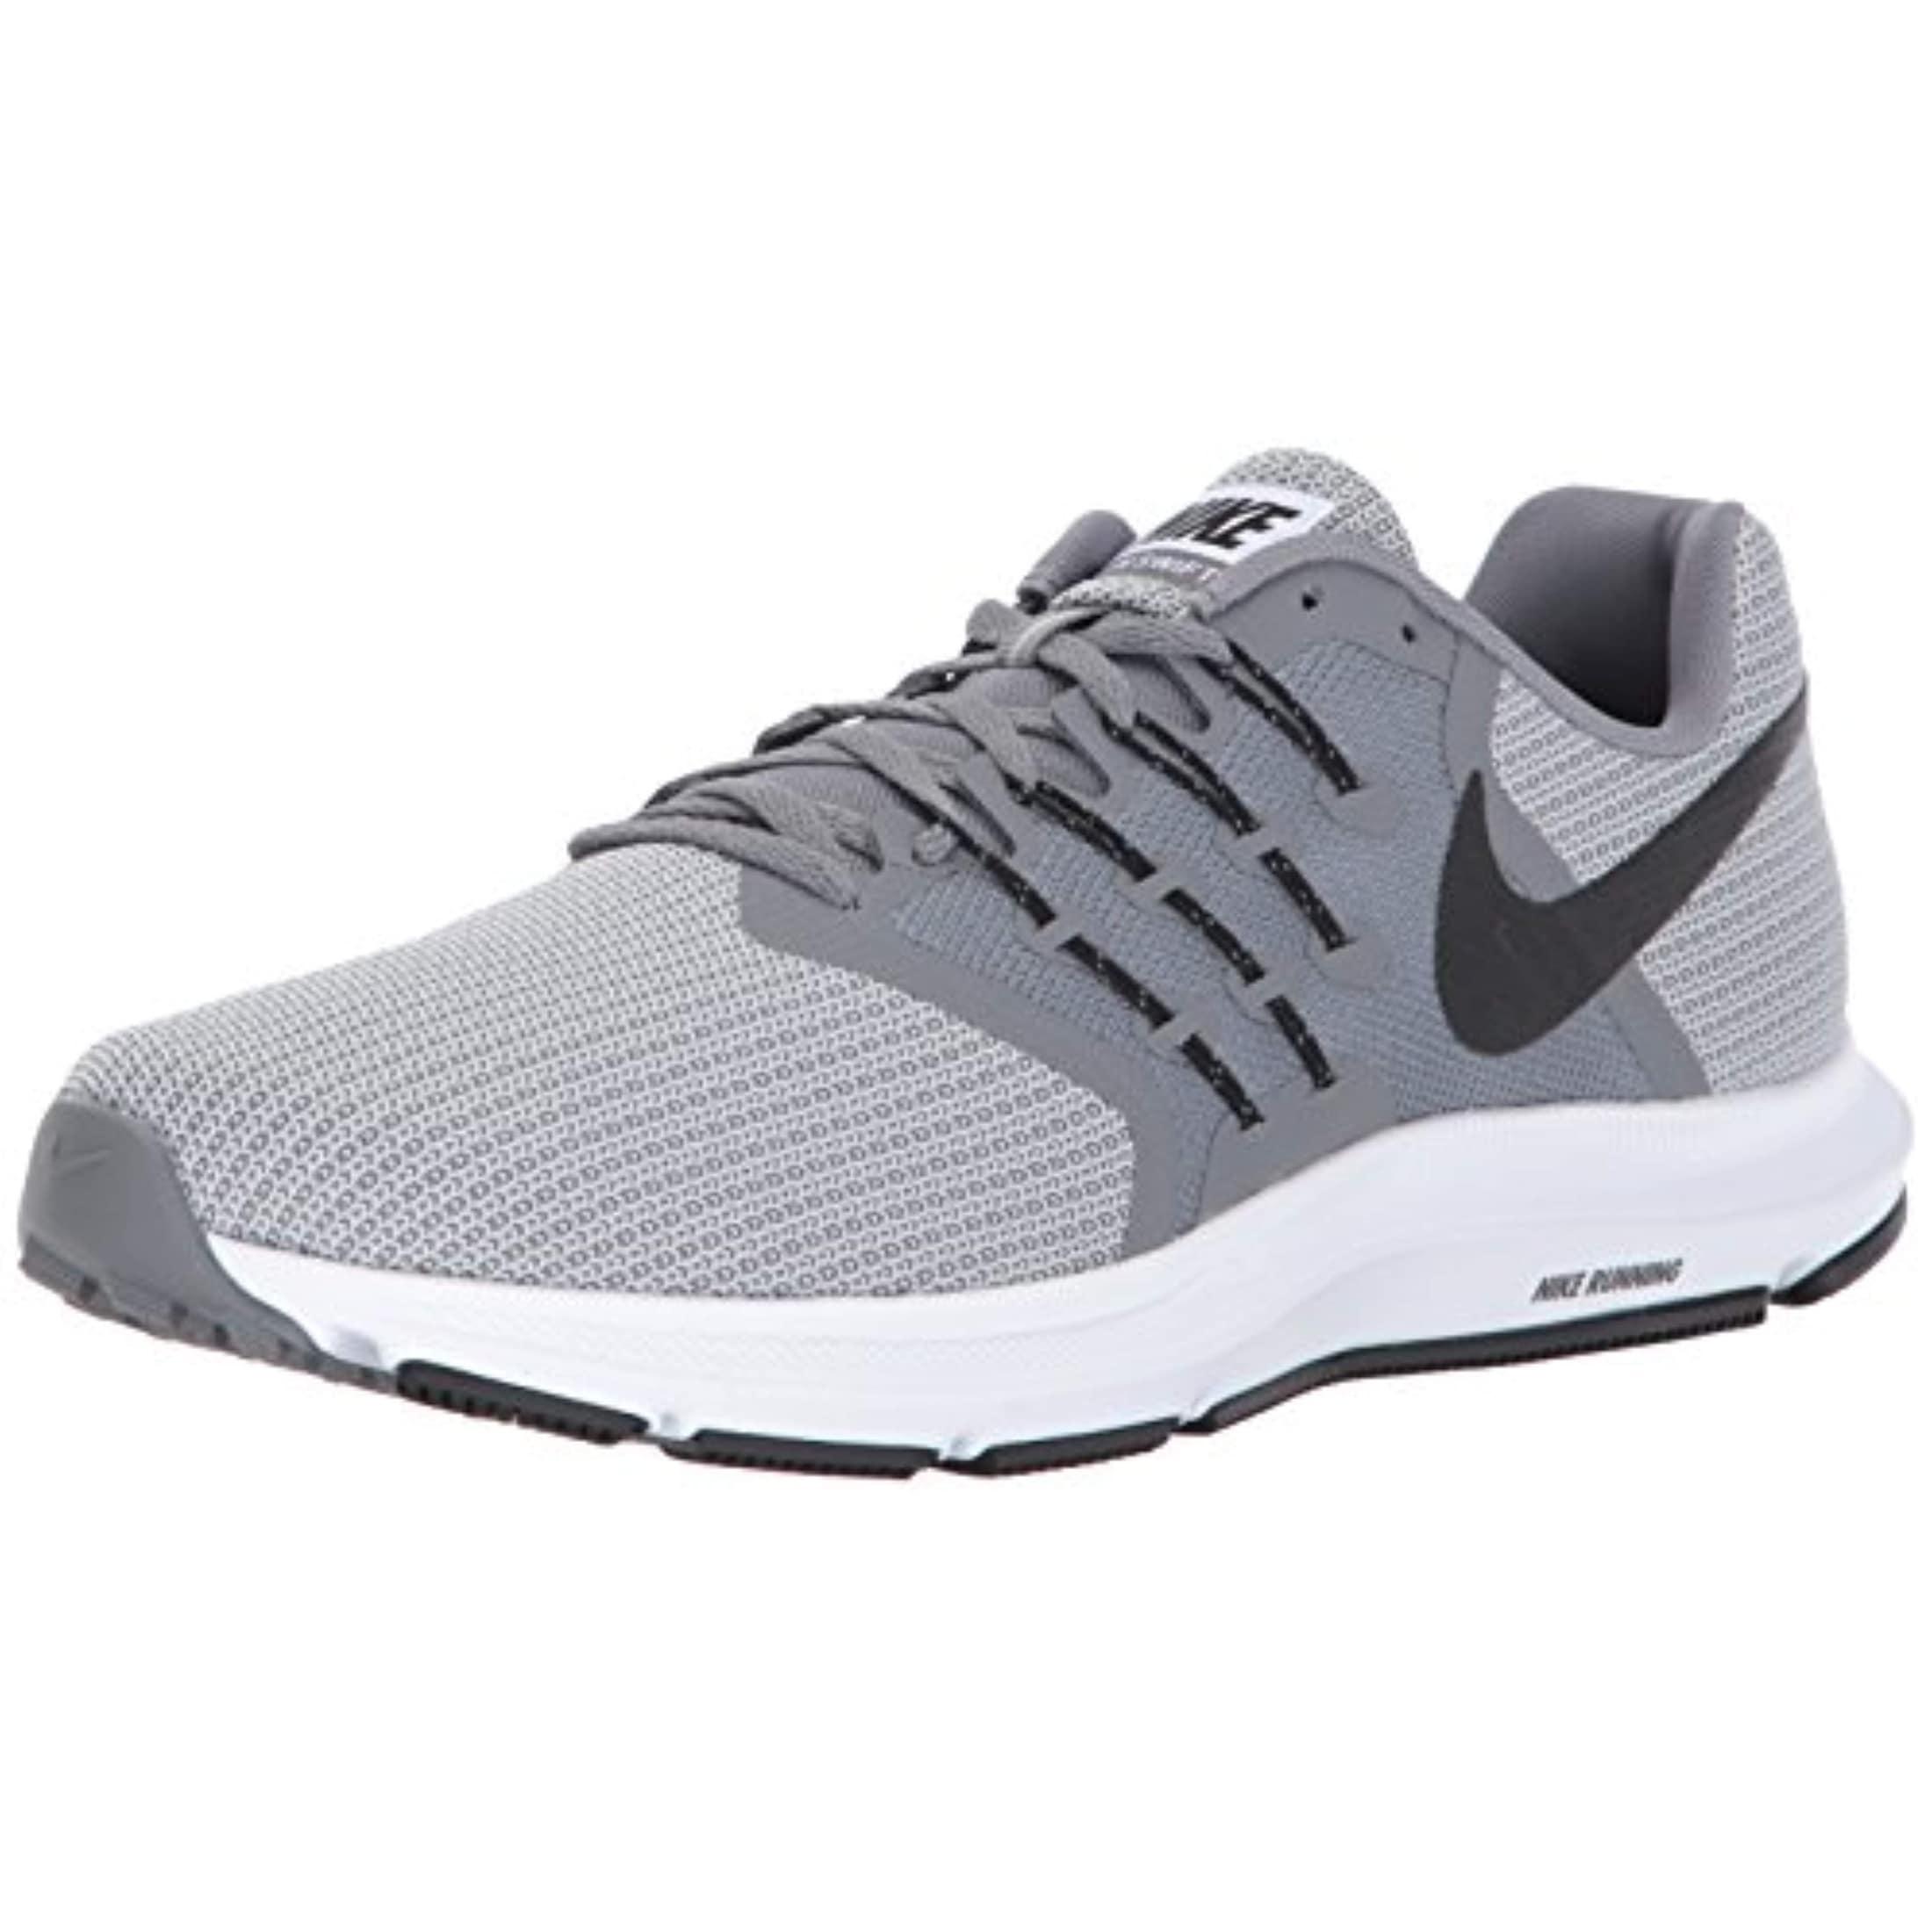 Swift Running Shoe, Cool Wolf Grey